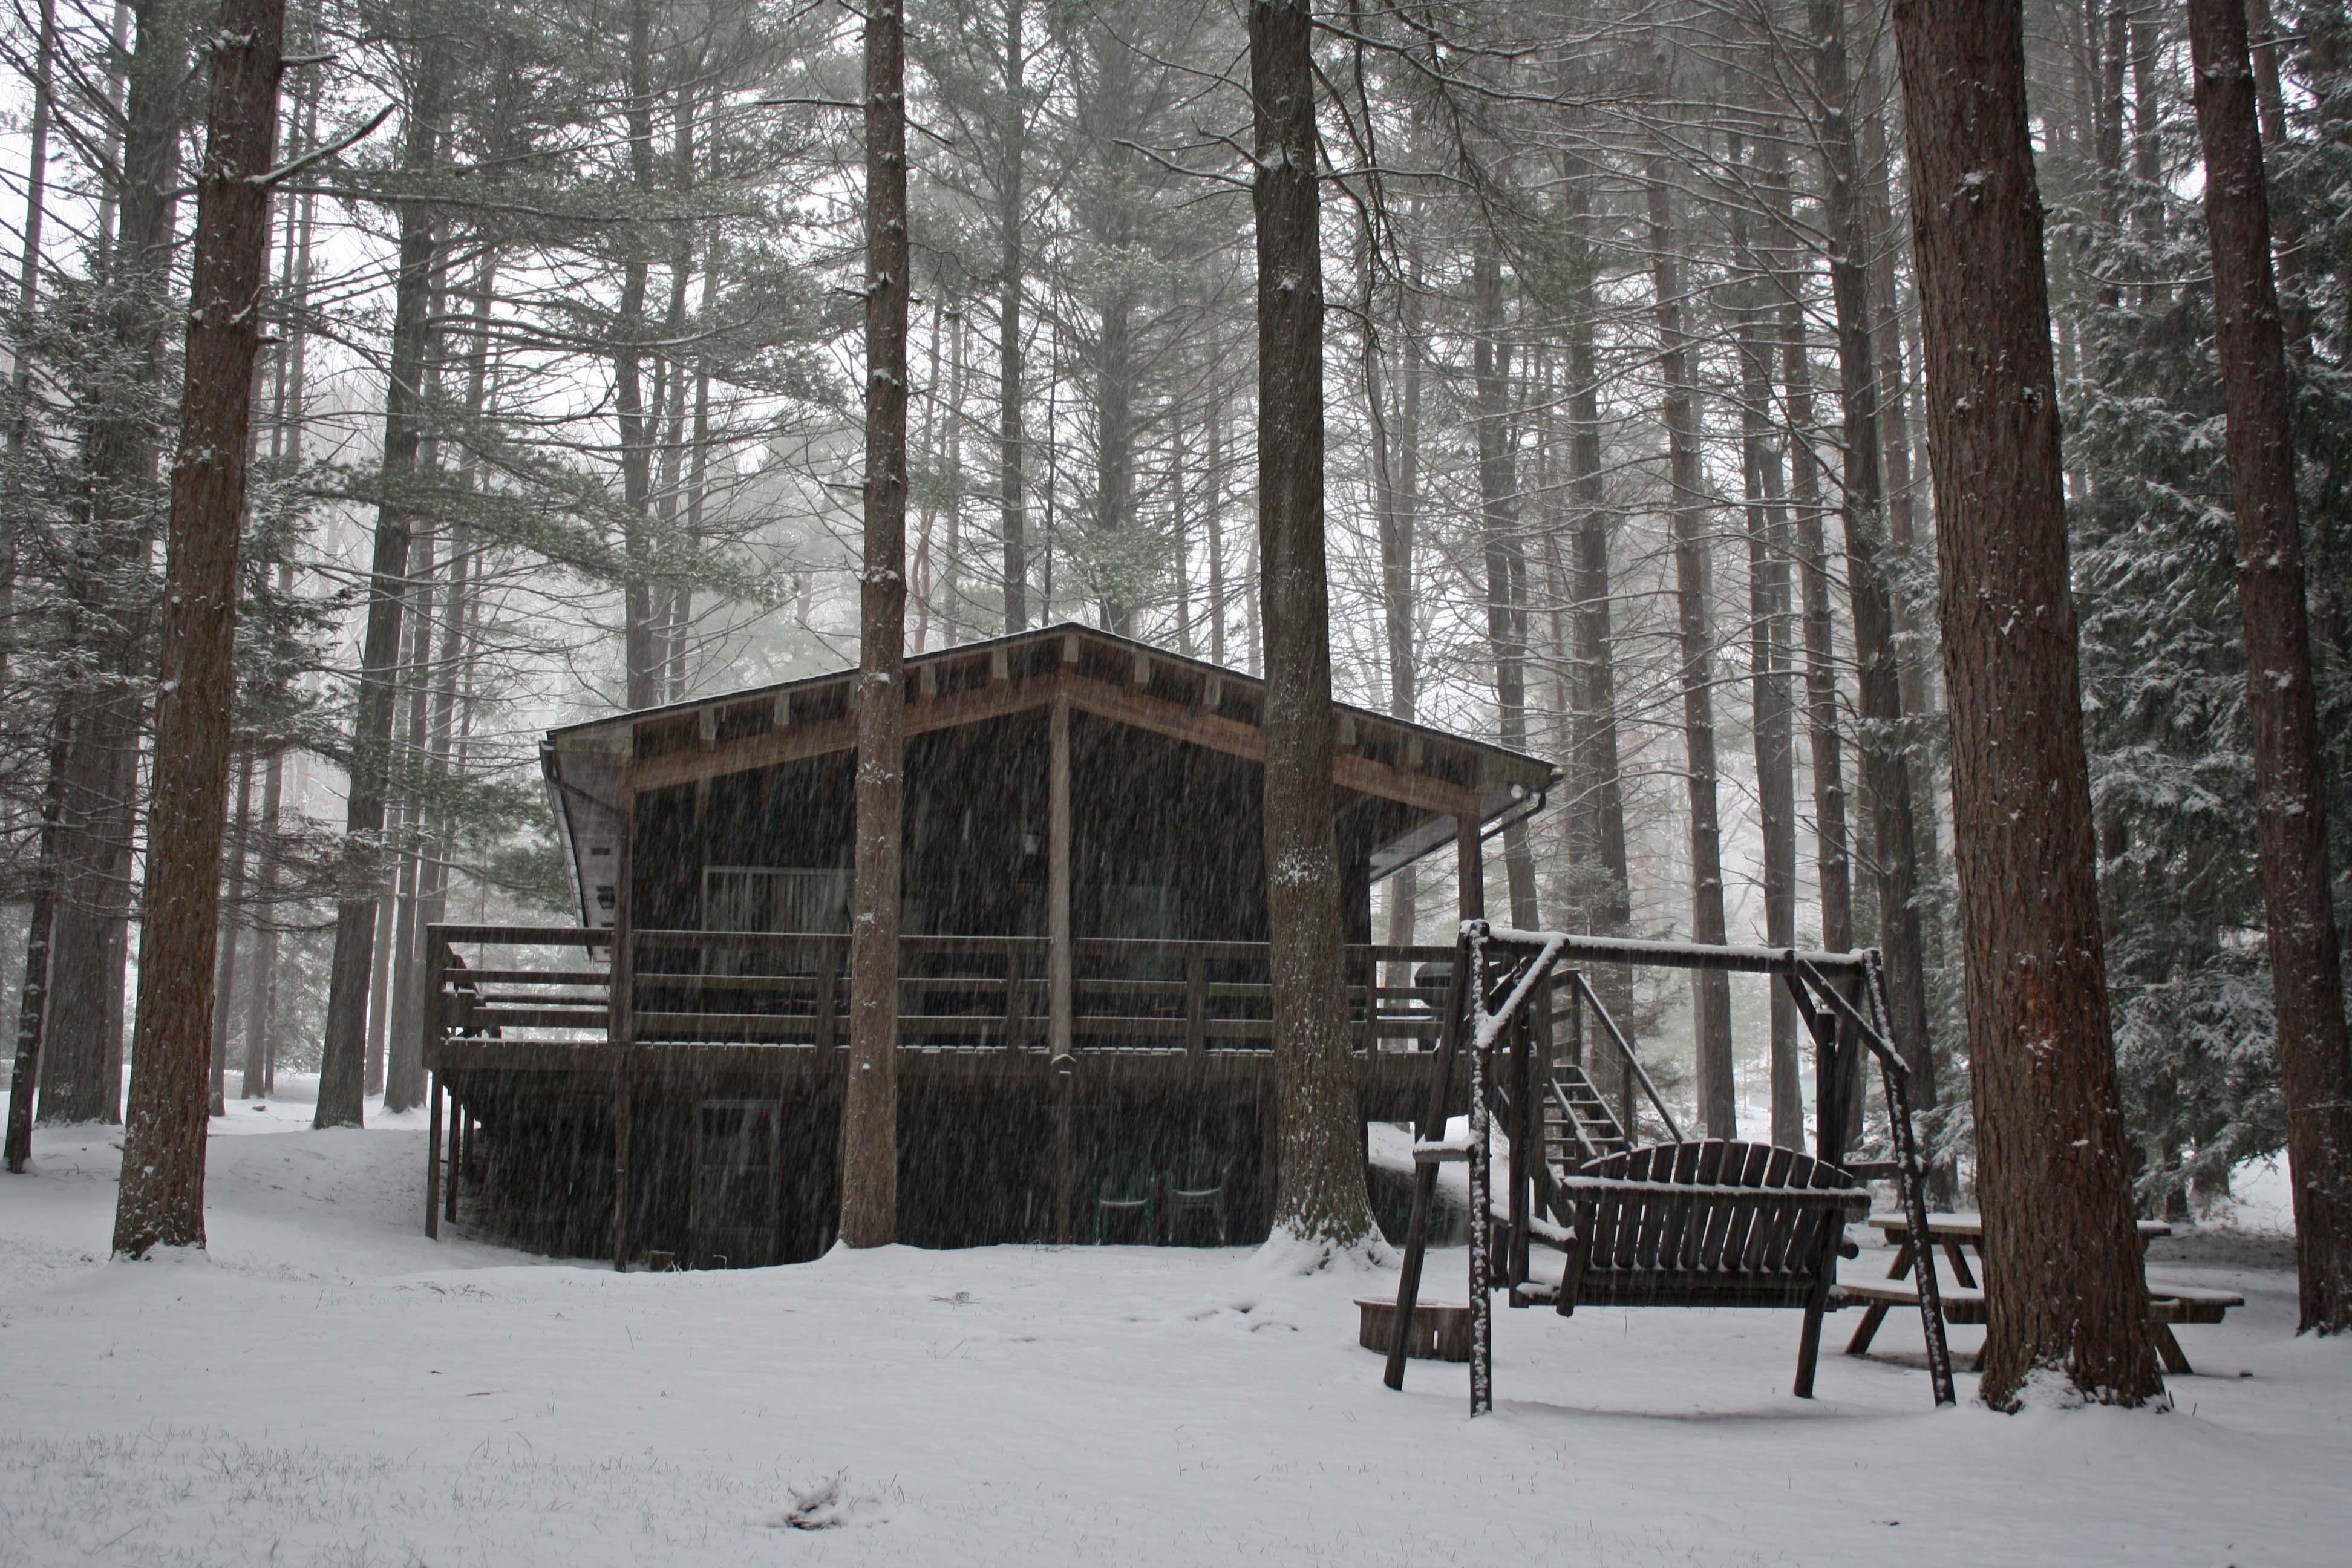 River Cottage Winter 2016 (edited)